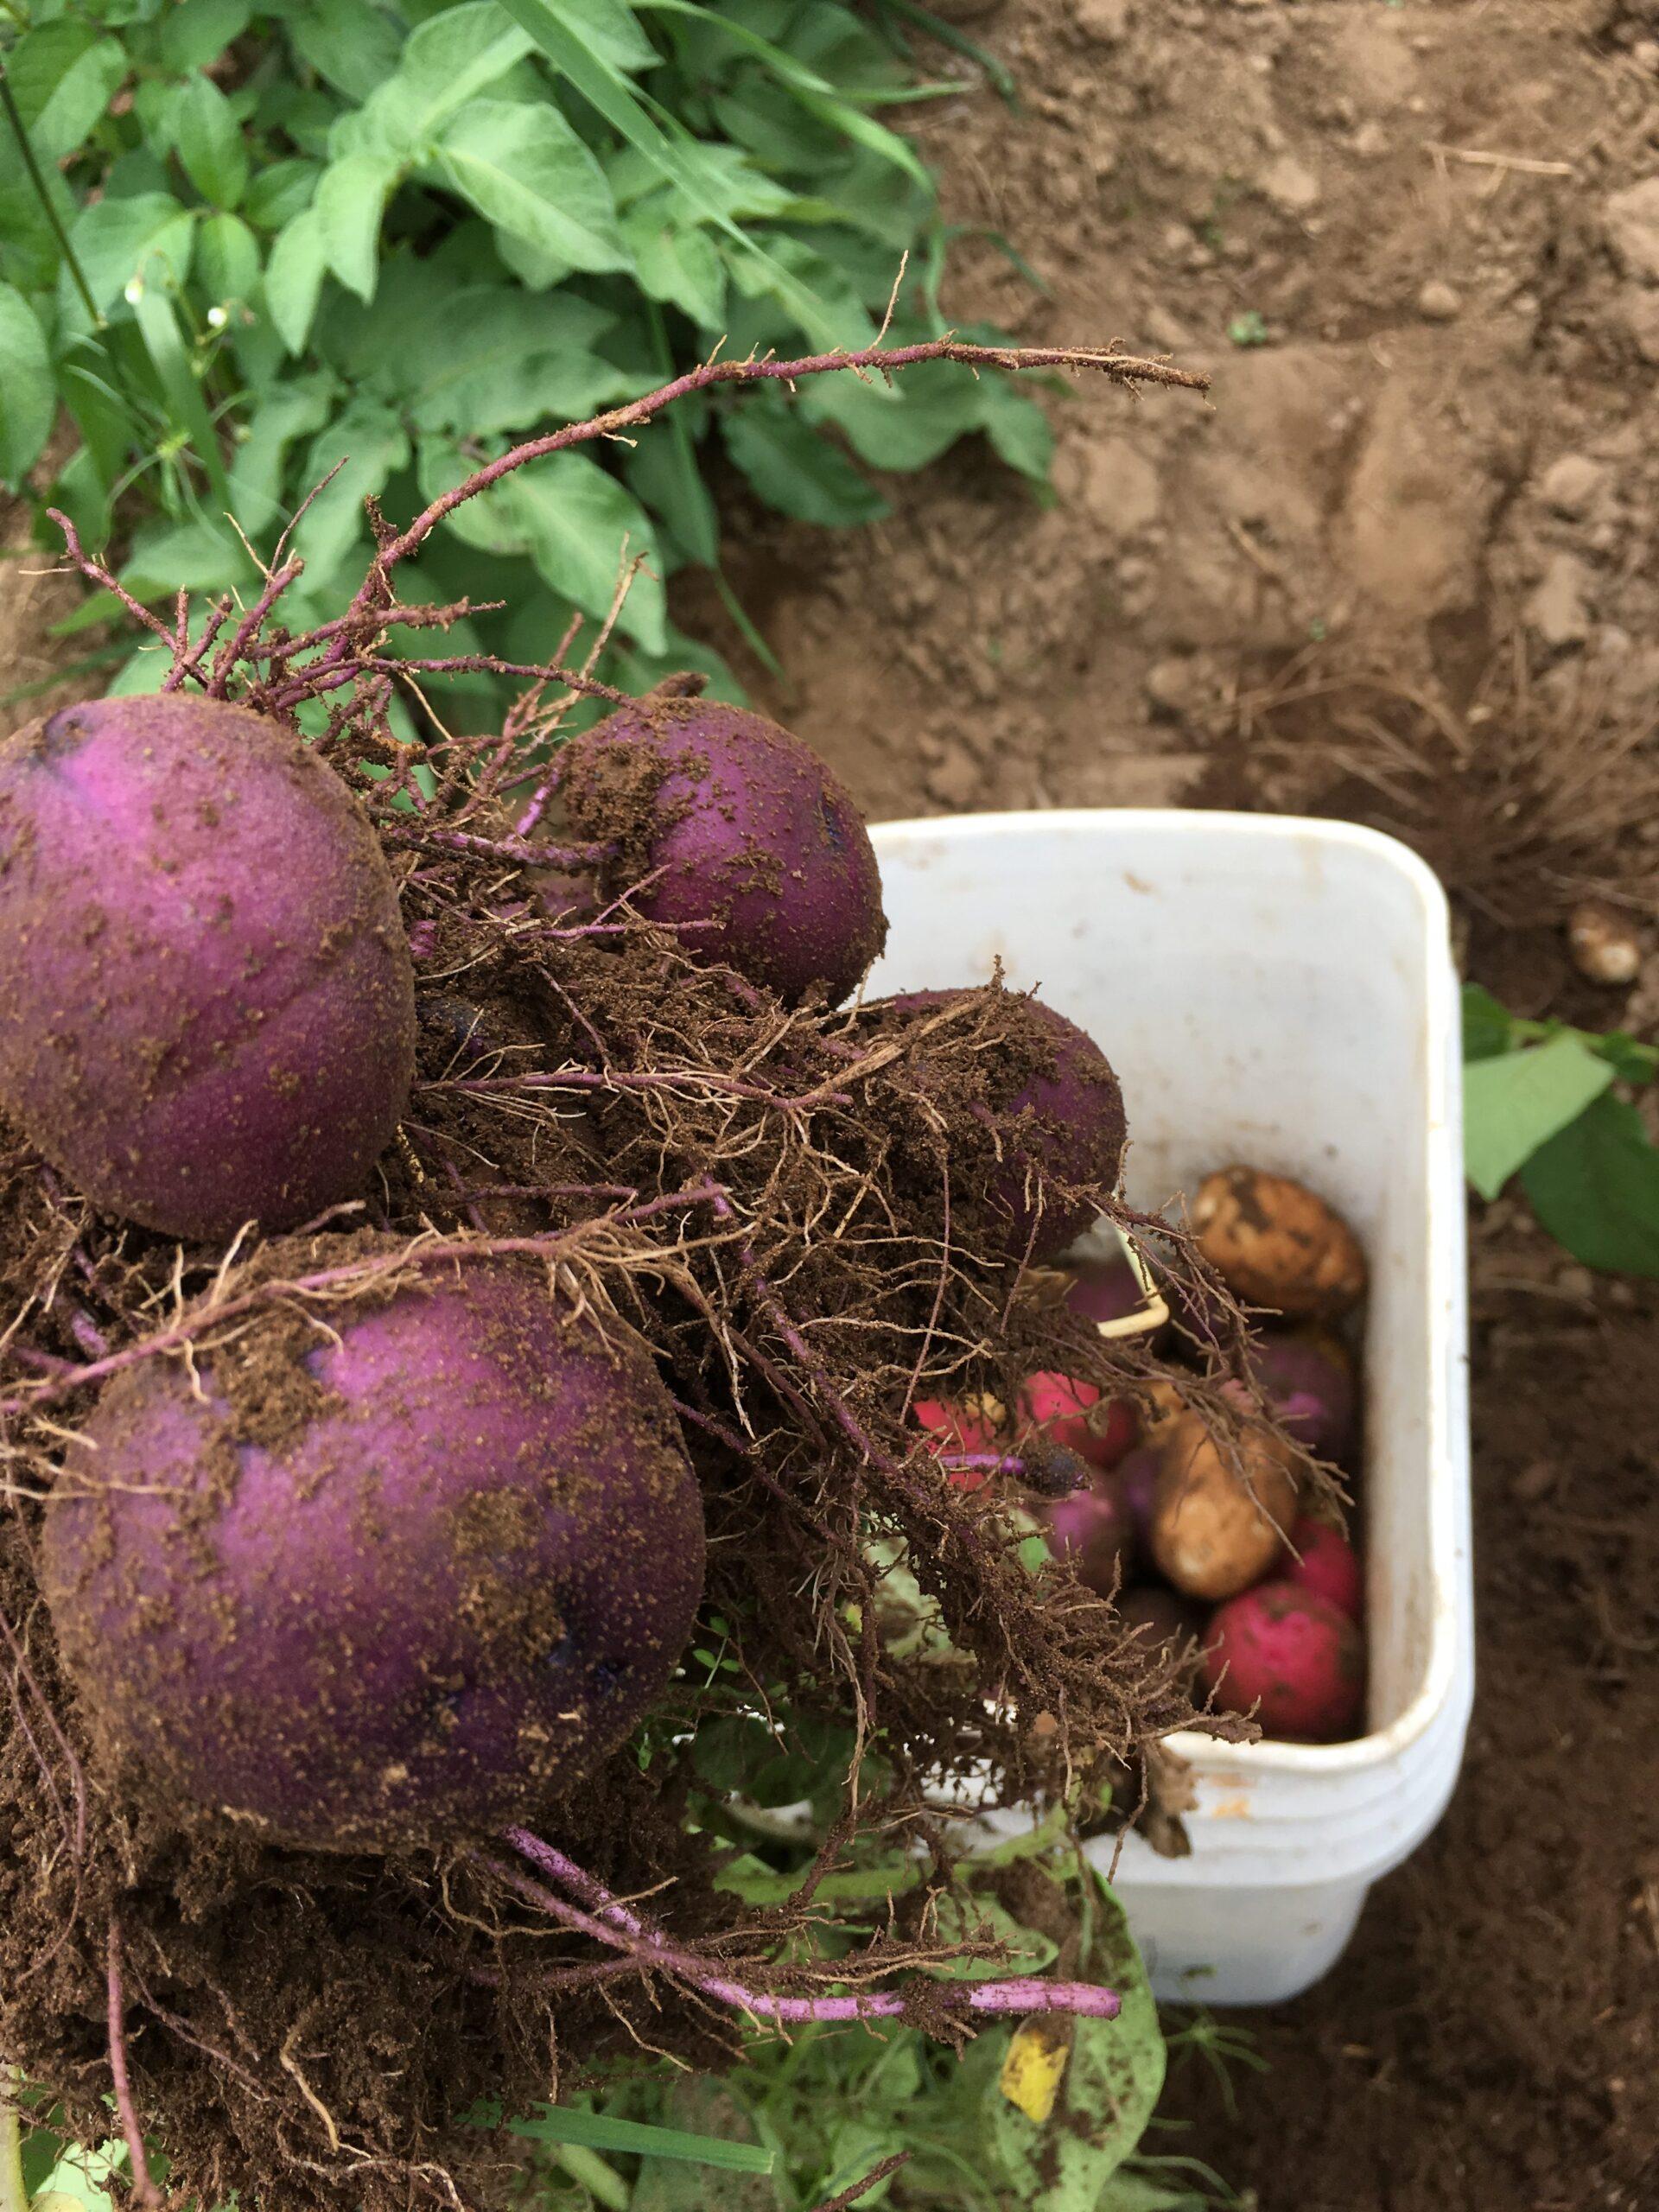 blue potatoes freshly harvested